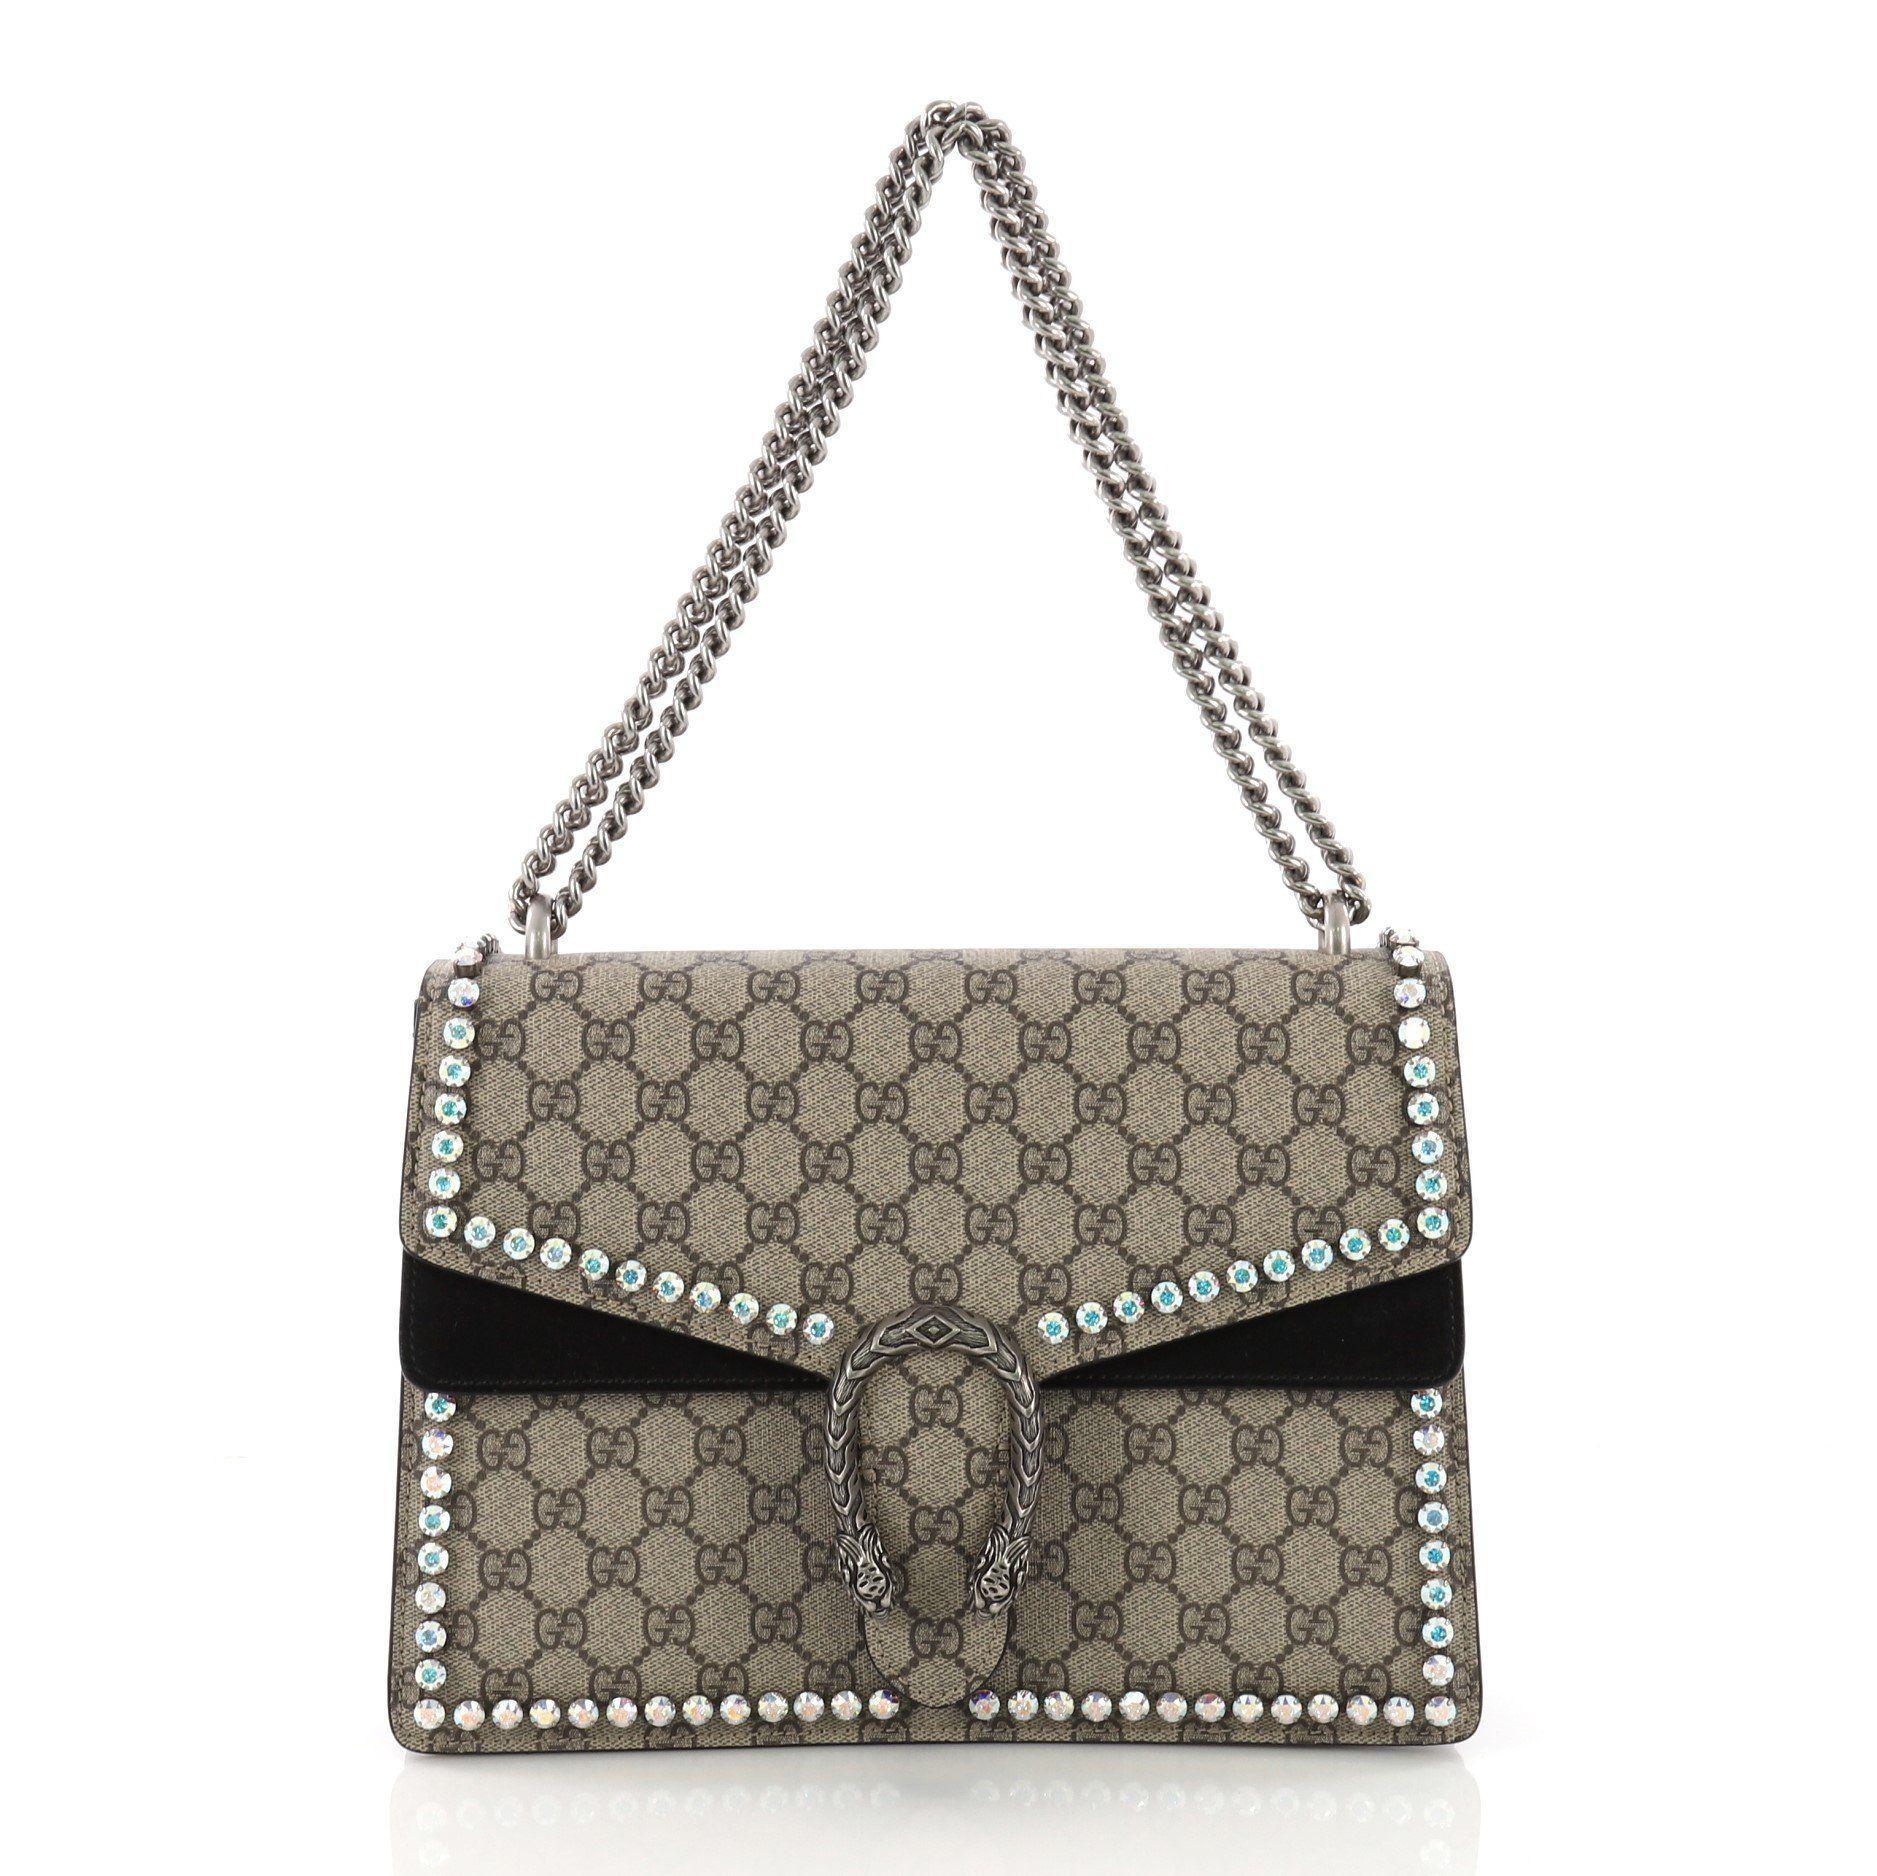 454afa9c3be3 Gucci. Women's Pre Owned Dionysus Handbag Crystal Embellished GG Coated  Canvas Medium